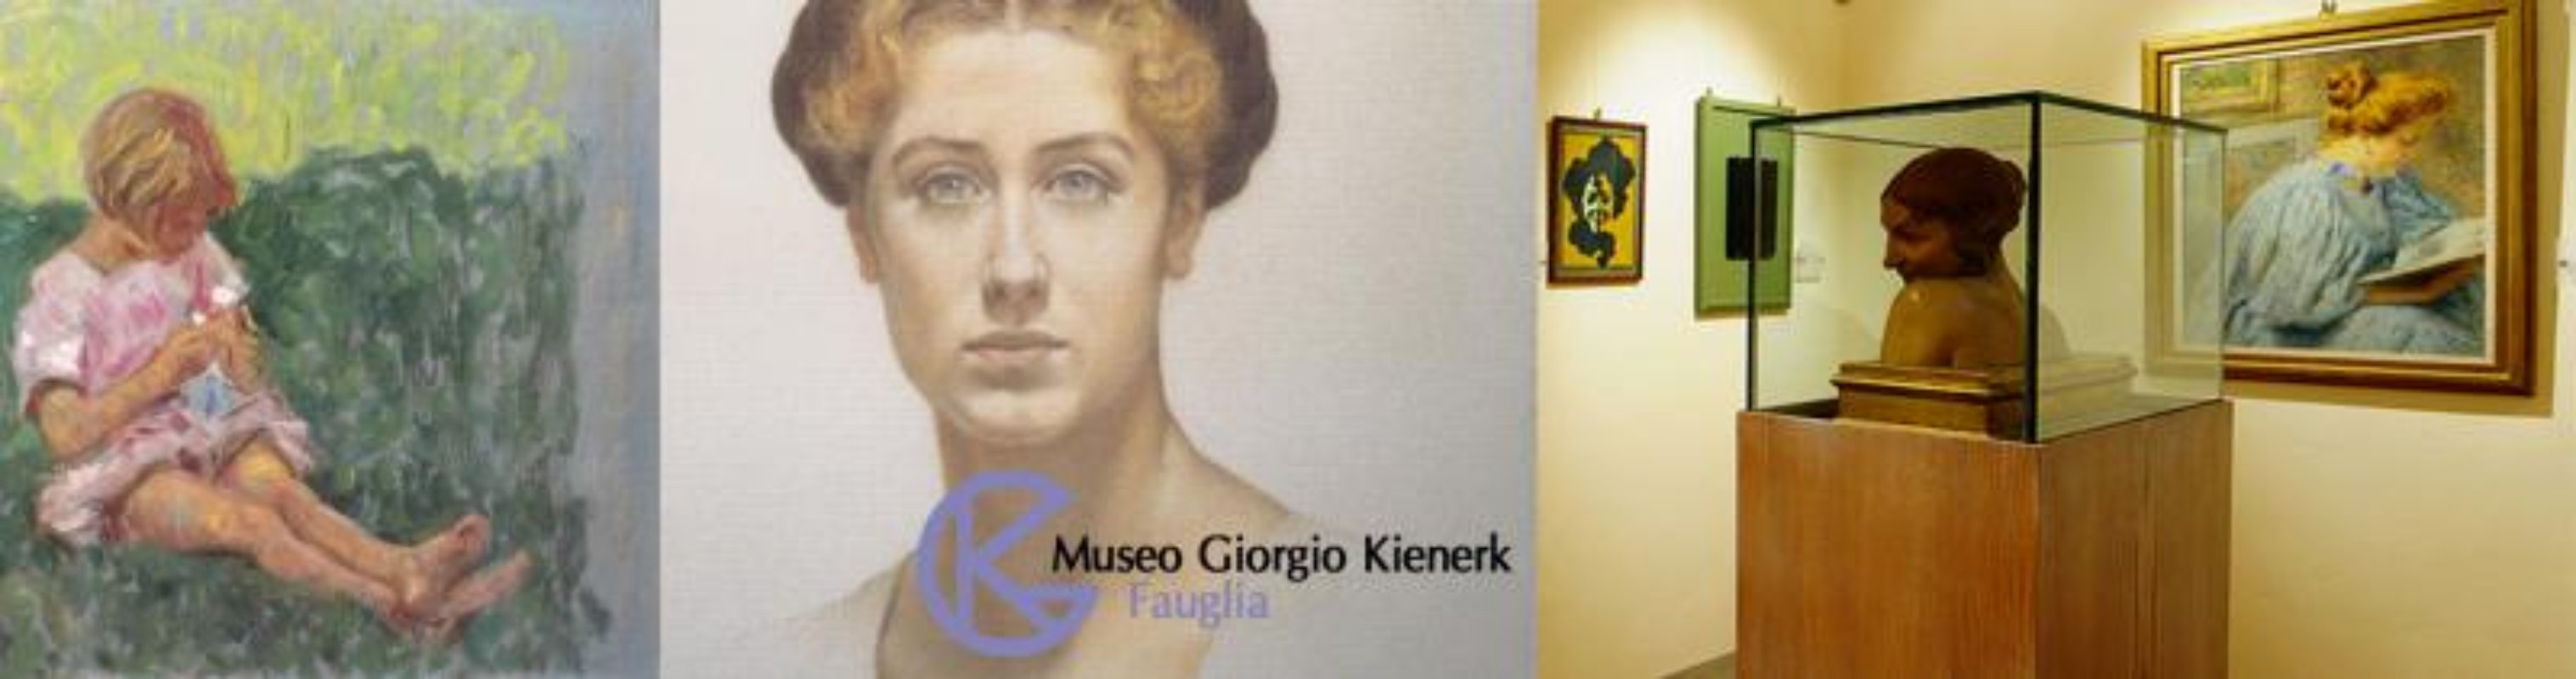 Kienerk Museum is open to visitors | Fauglia